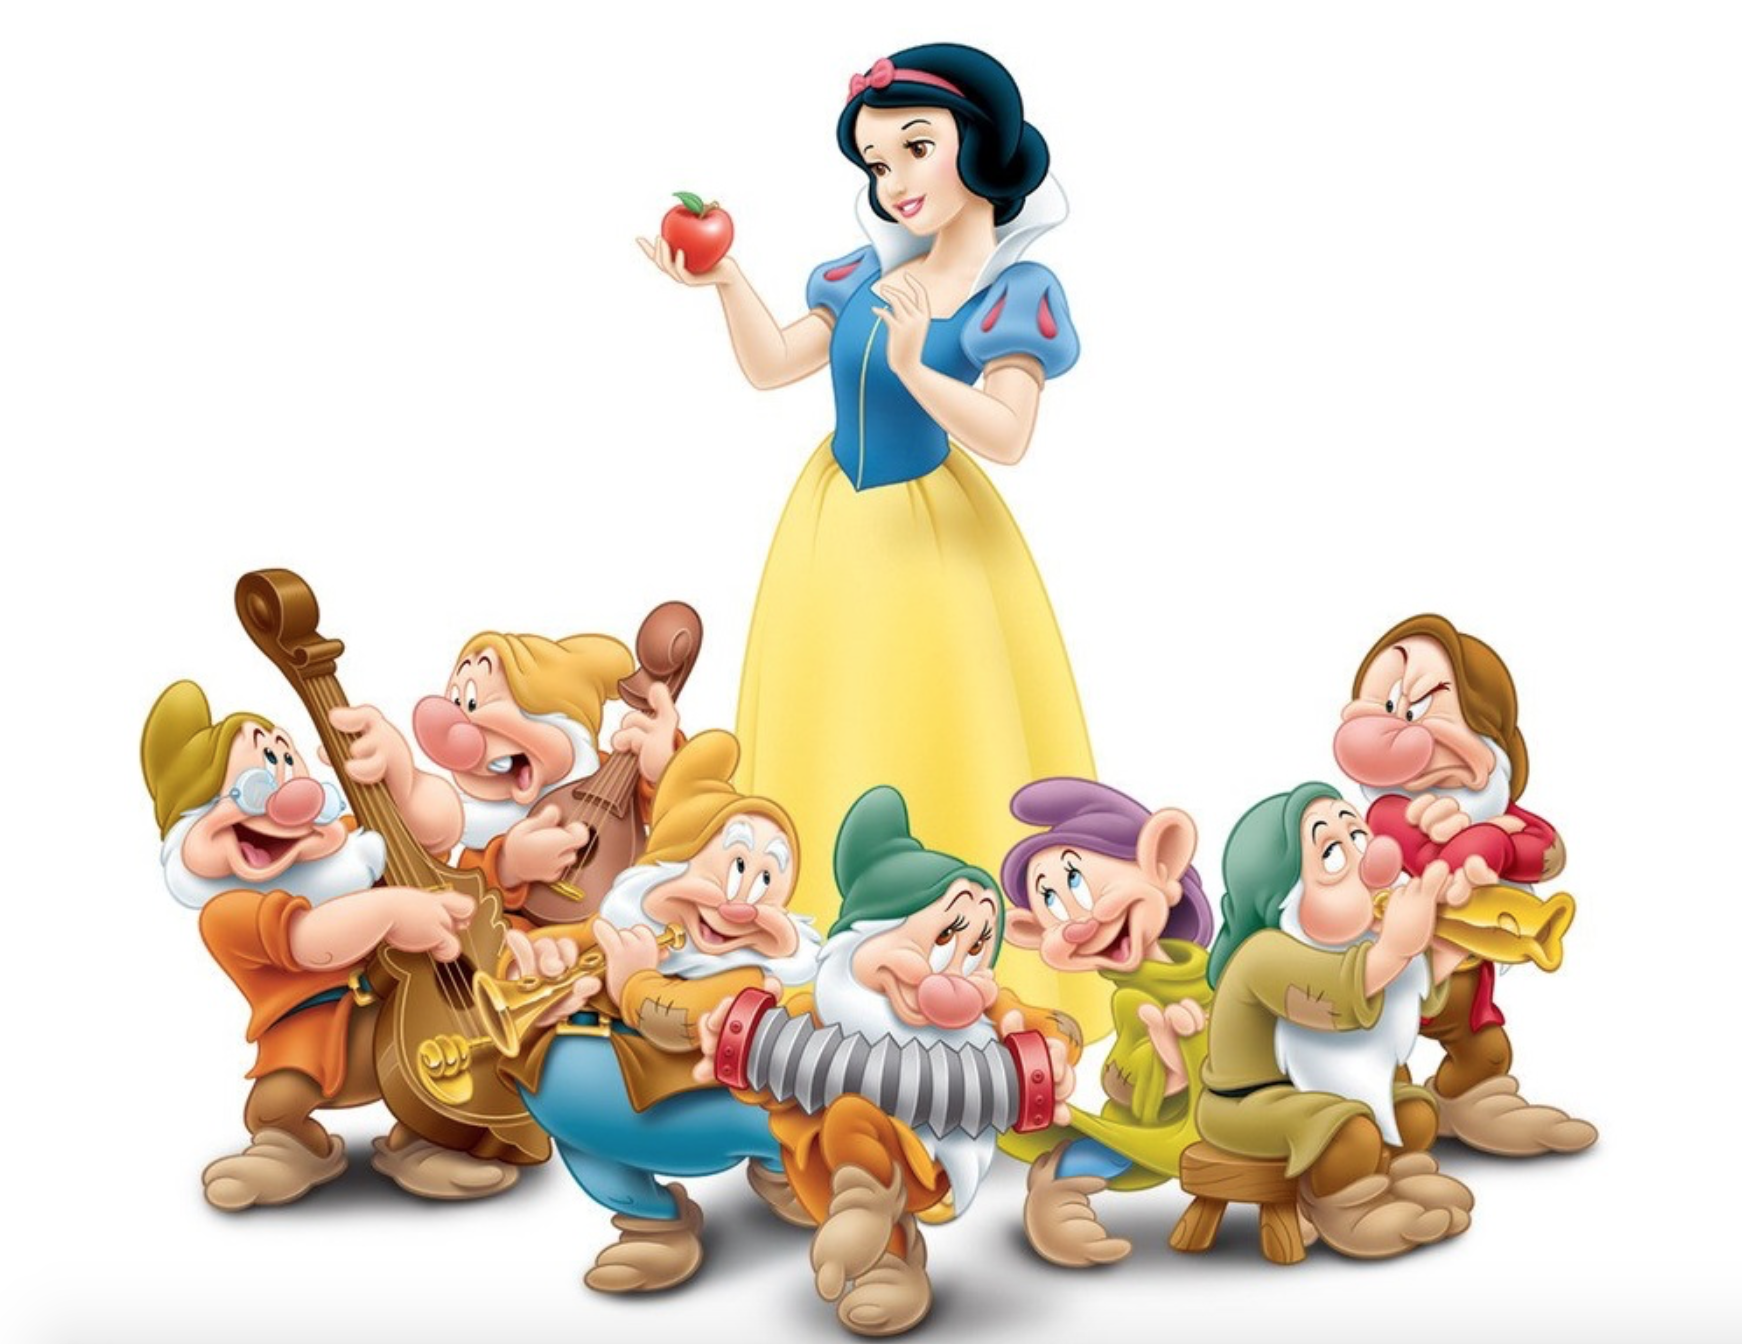 Pictures of snow white and seven dwarfs Bavarian Castles Tour 2018